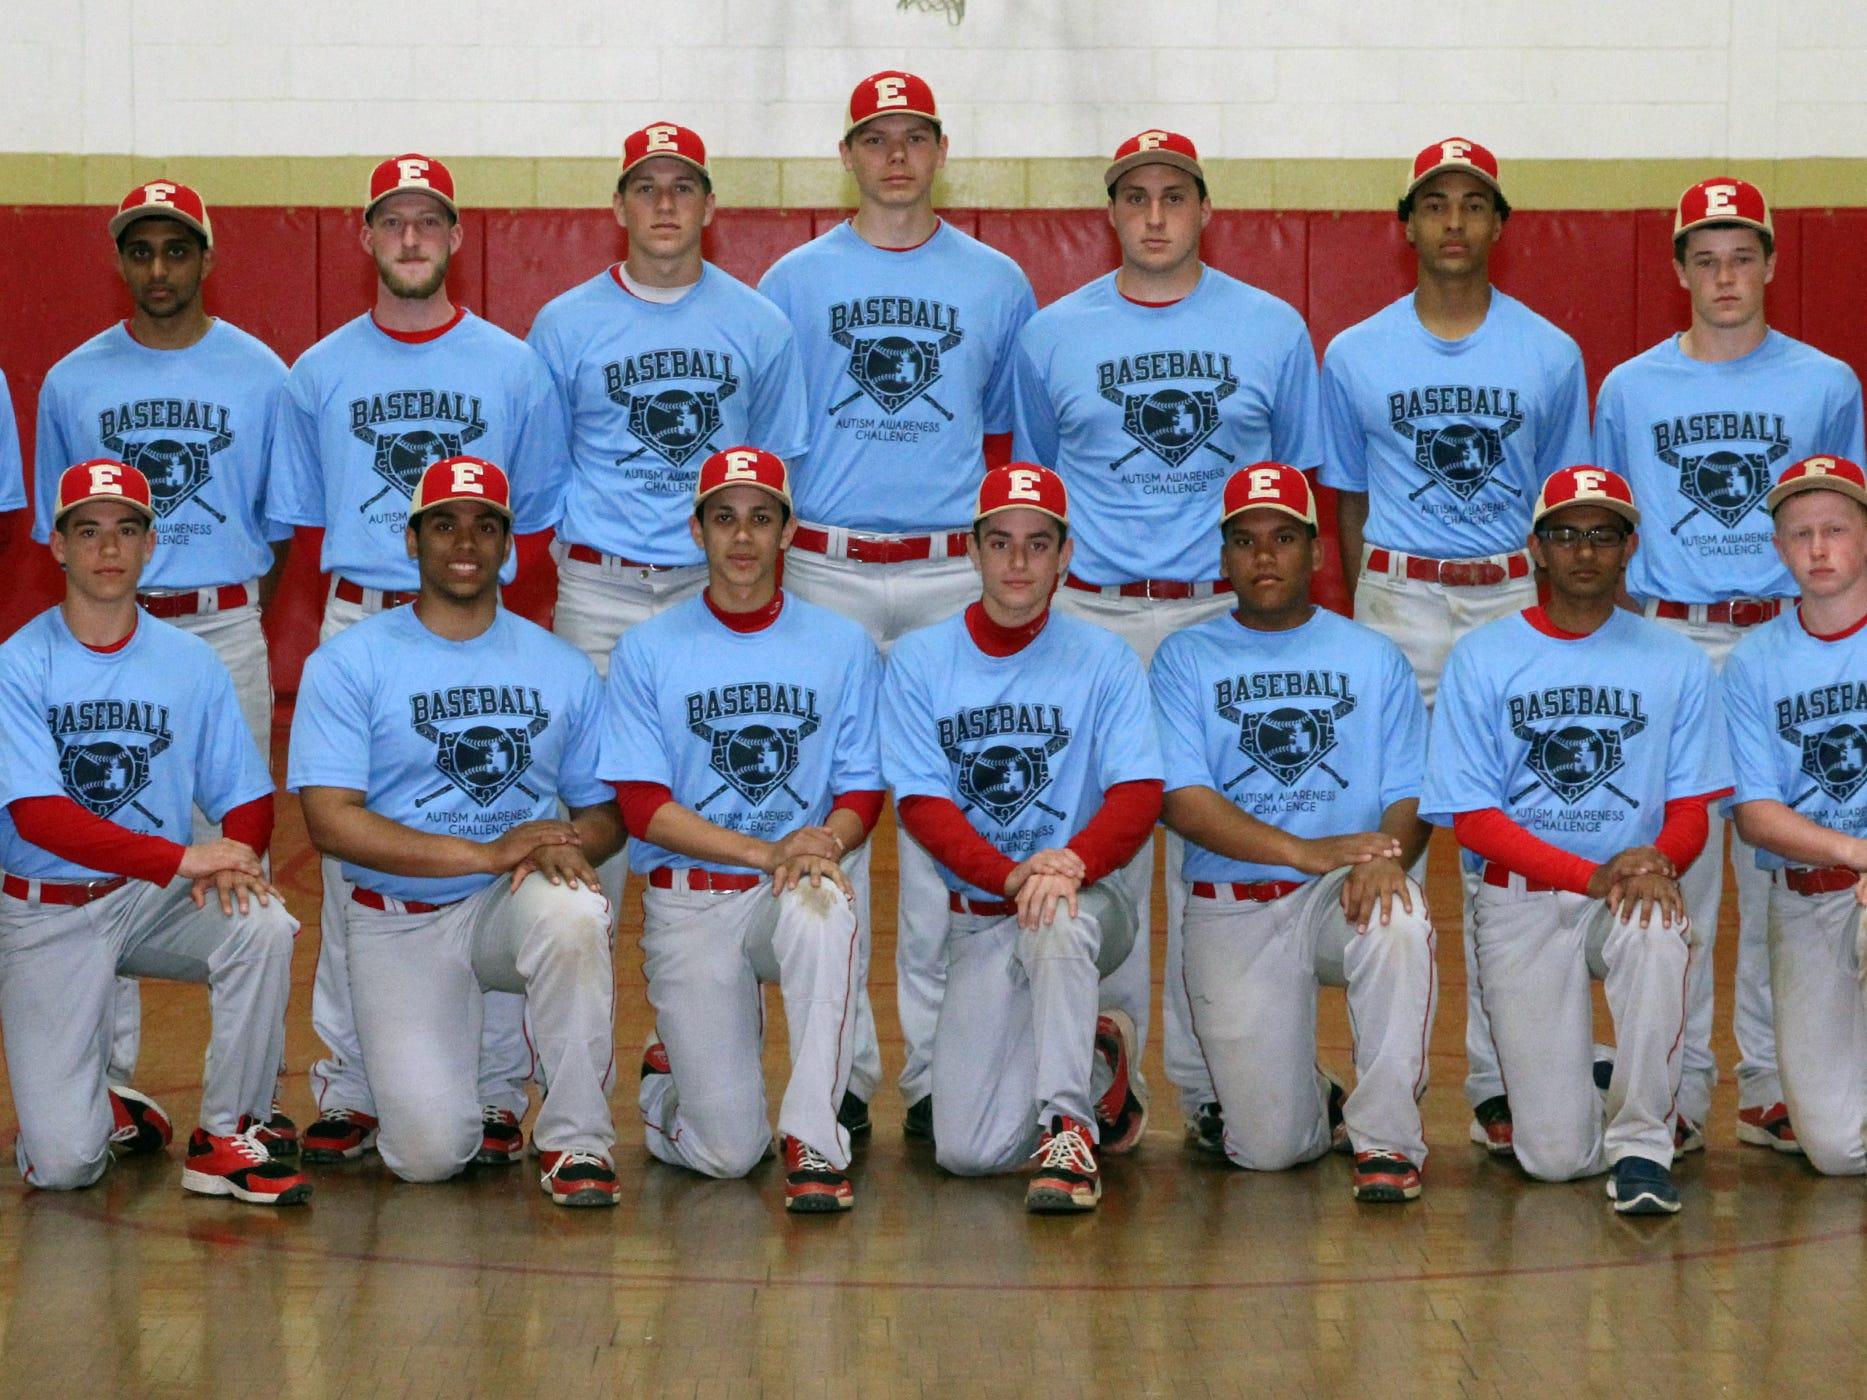 Edison High School baseball players wearing their T-shirts for the upcoming Autism Awareness Baseball Challenge.